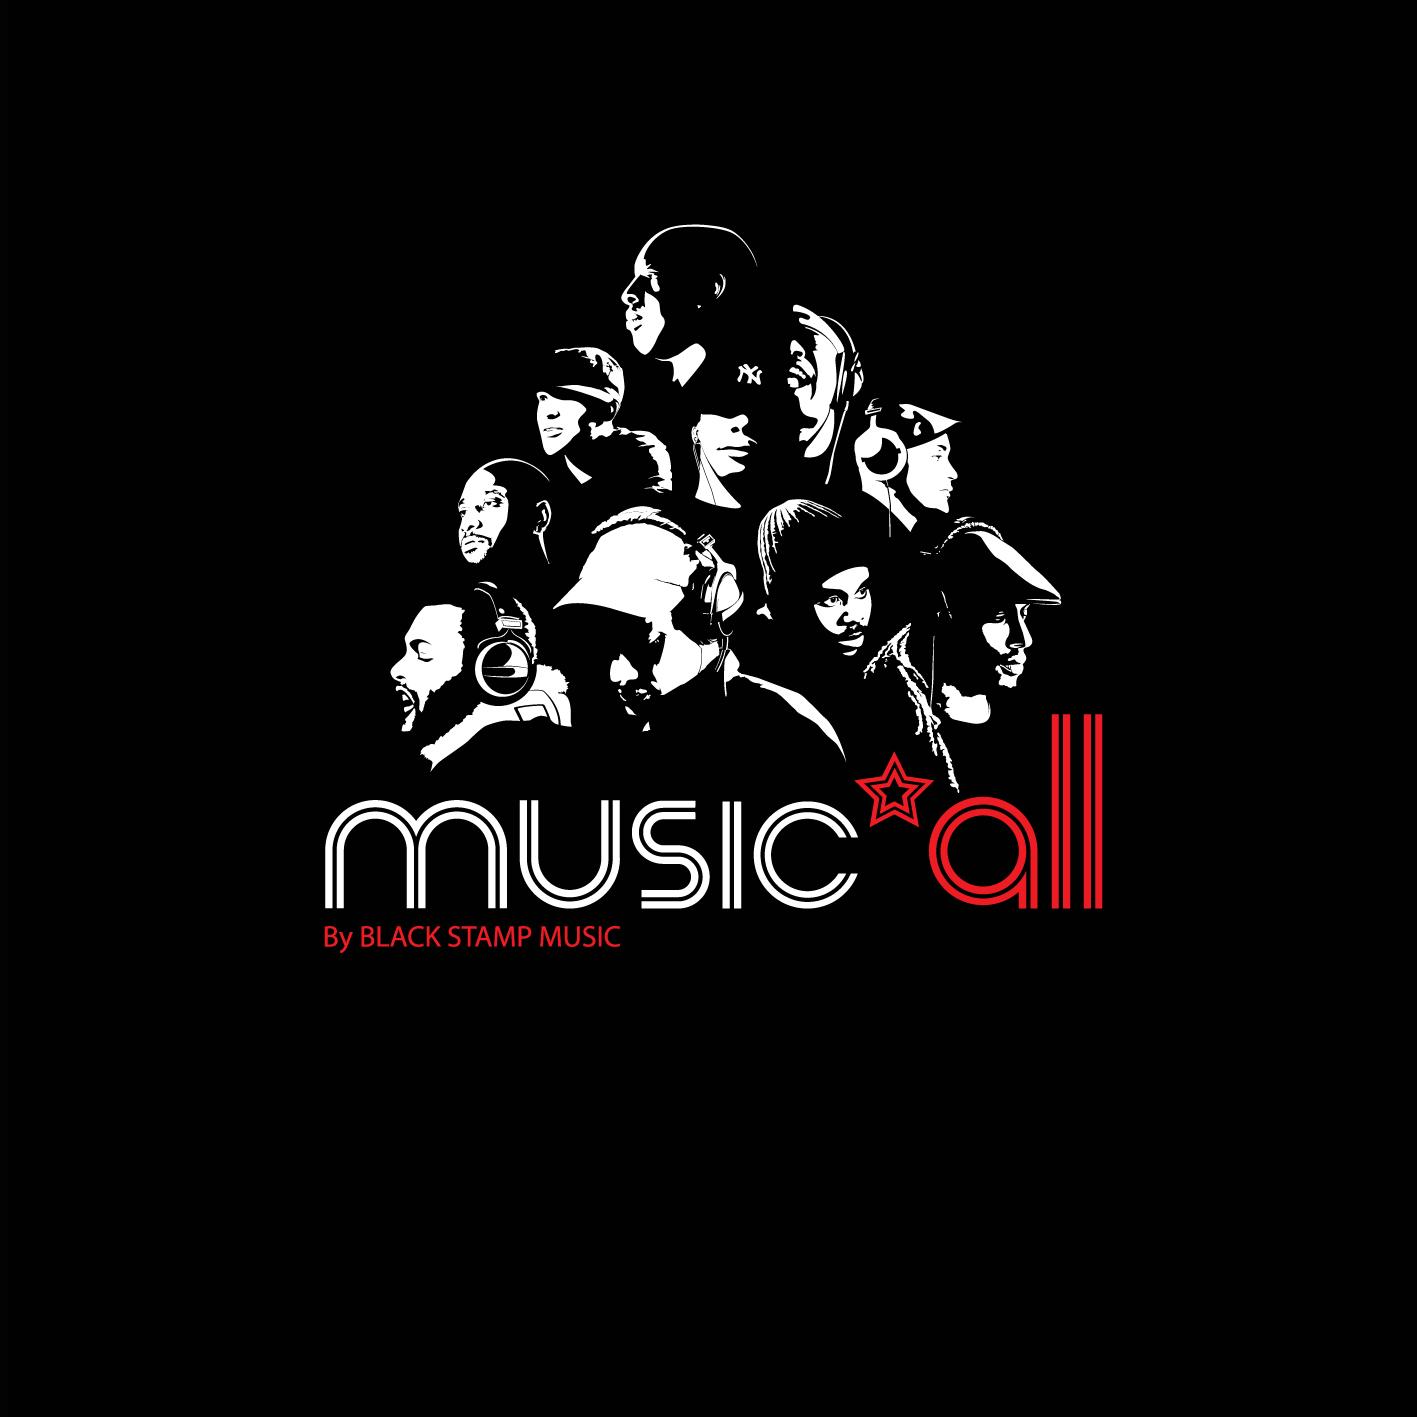 MUSIC'ALL